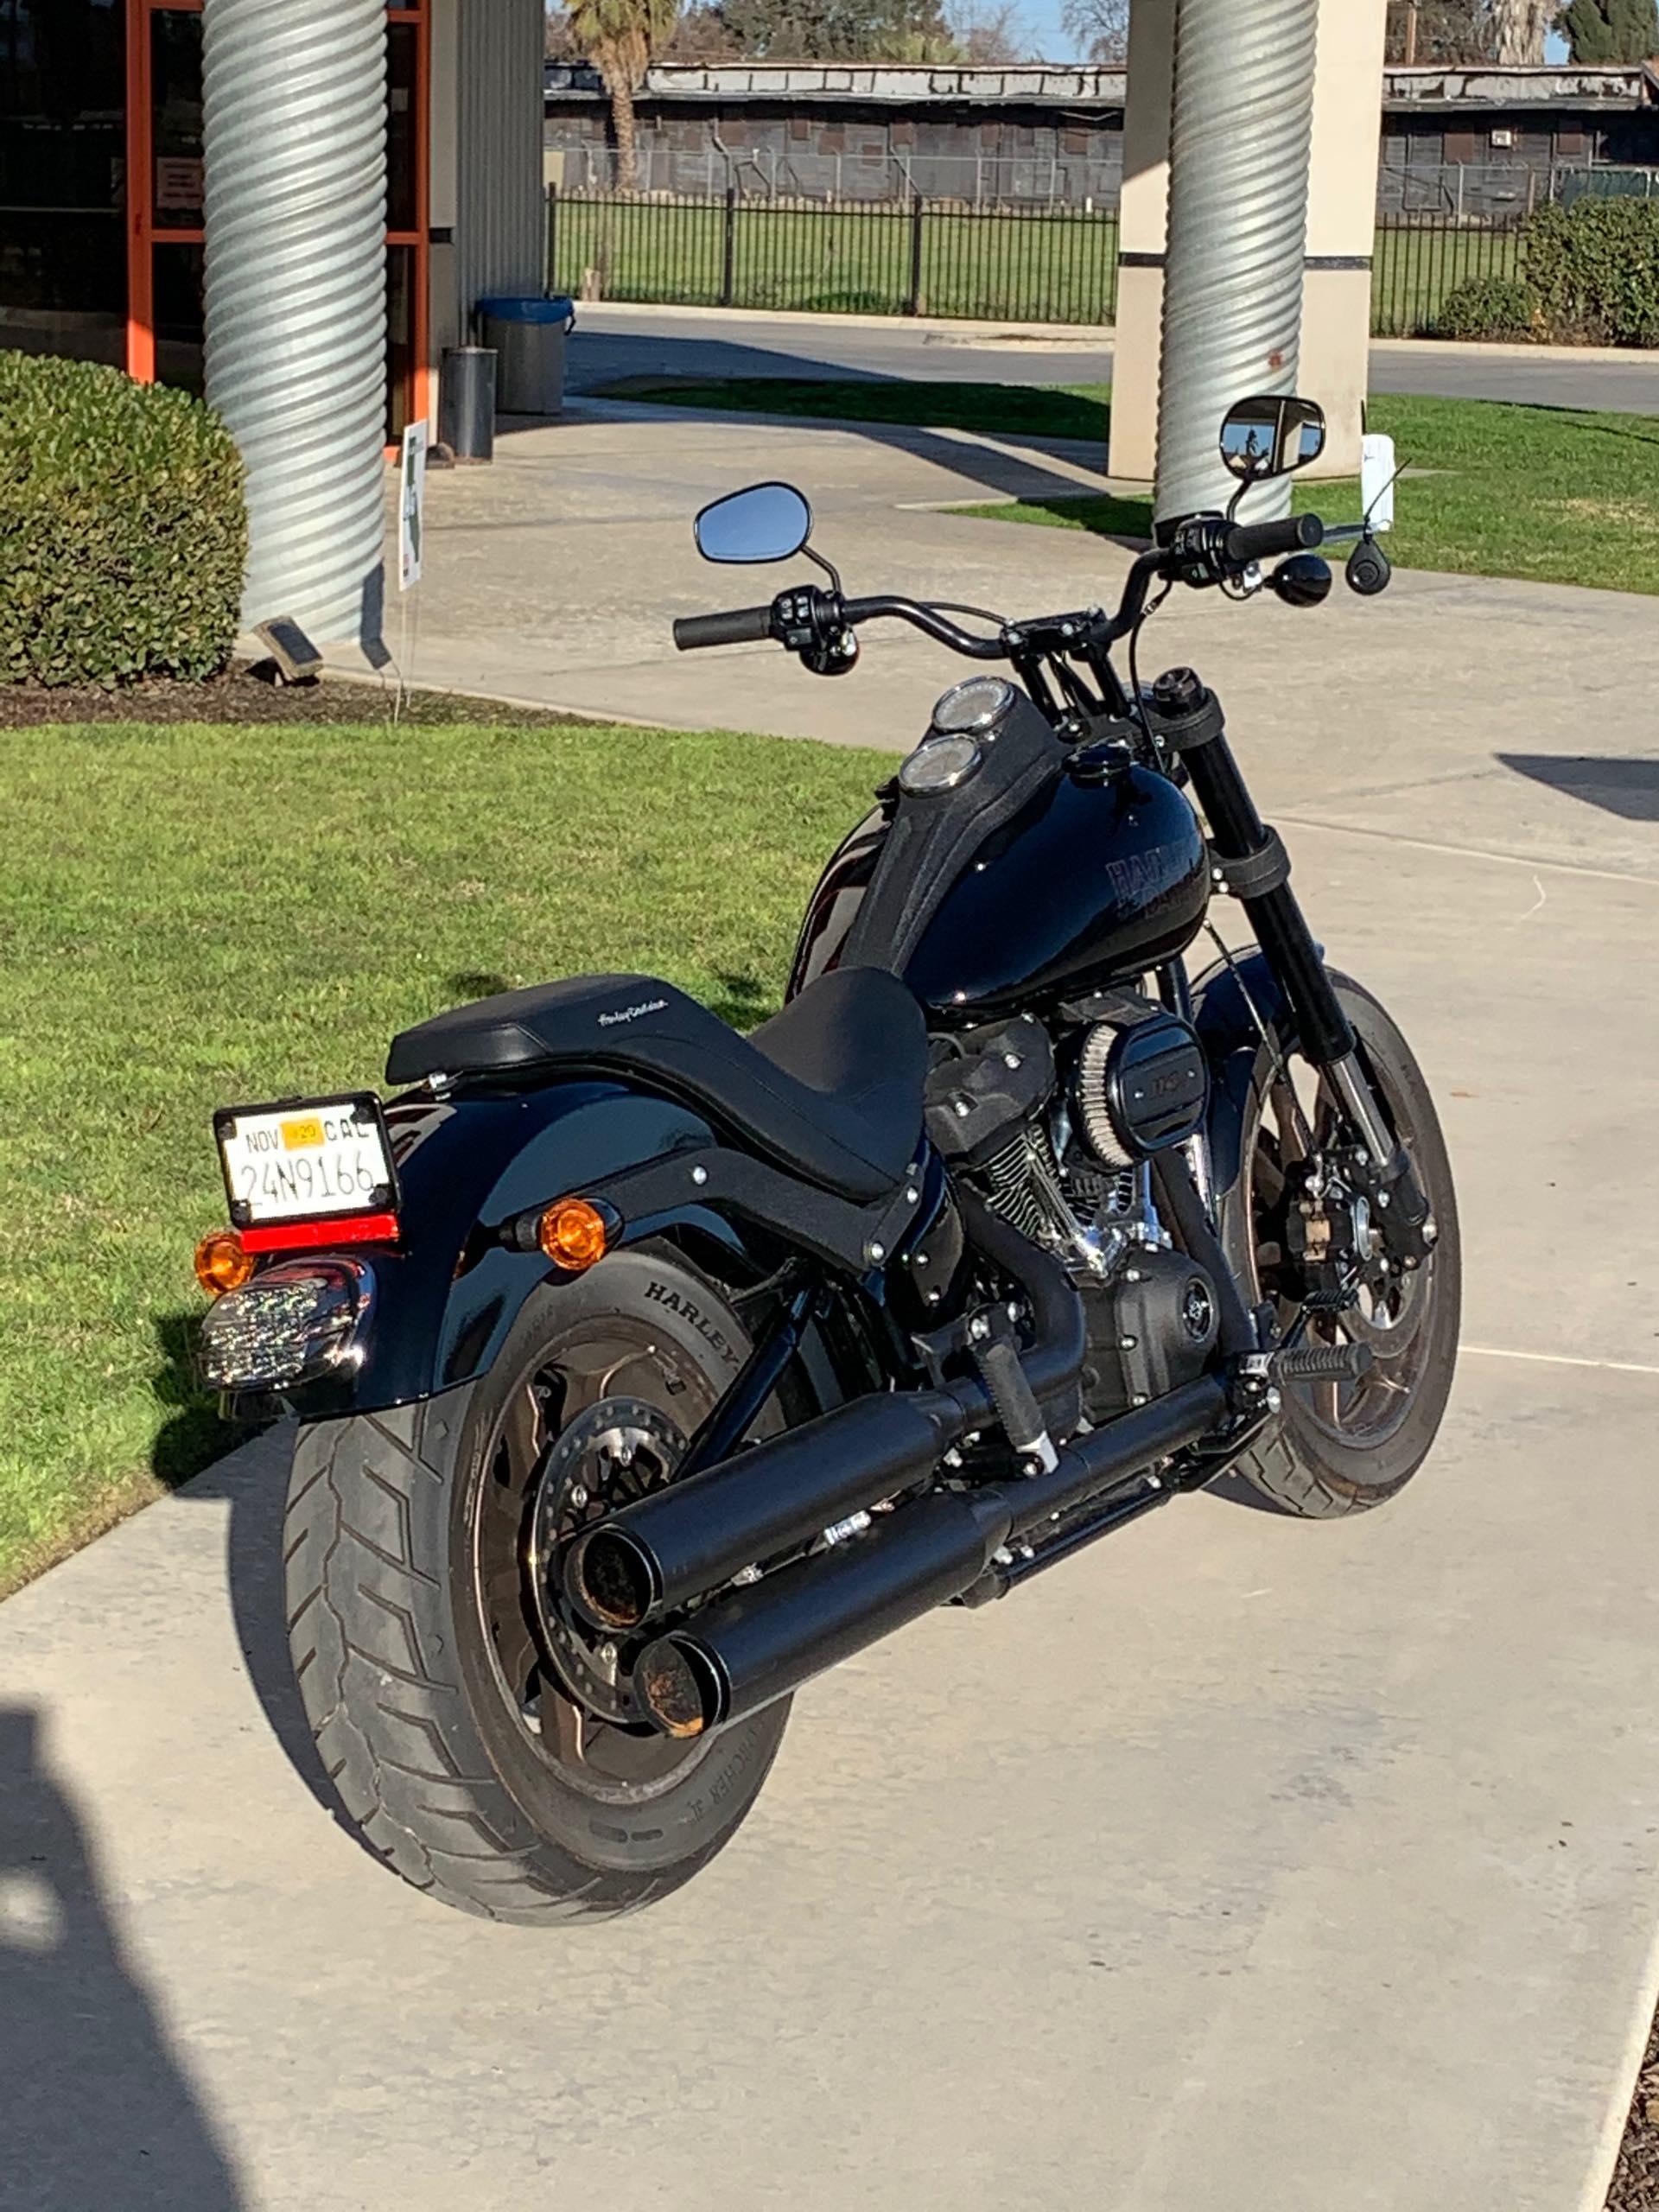 2020 Harley-Davidson Softail Low Rider S at Visalia Harley-Davidson